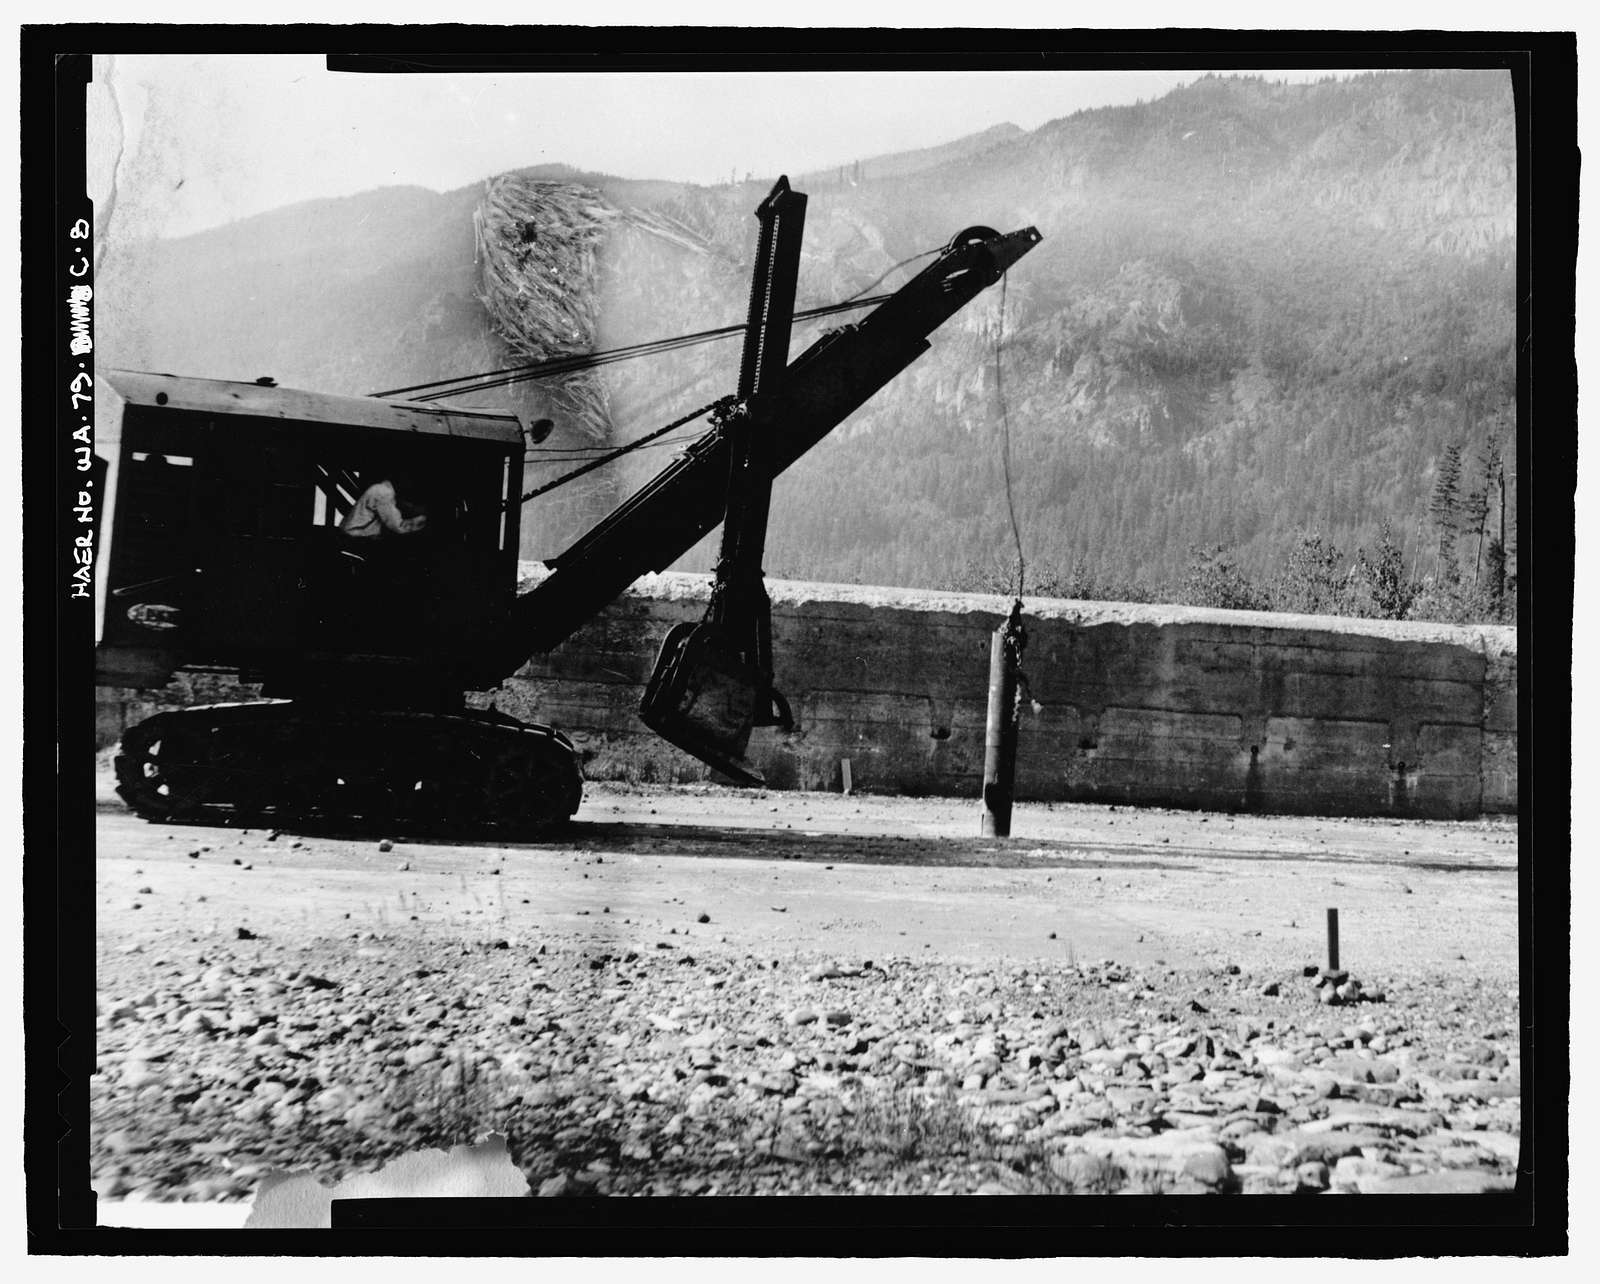 Kachess Dam, Dike Closing 1913 Spillway, Kachess River, 1.5 miles north of Interstate 90, Easton, Kittitas County, WA